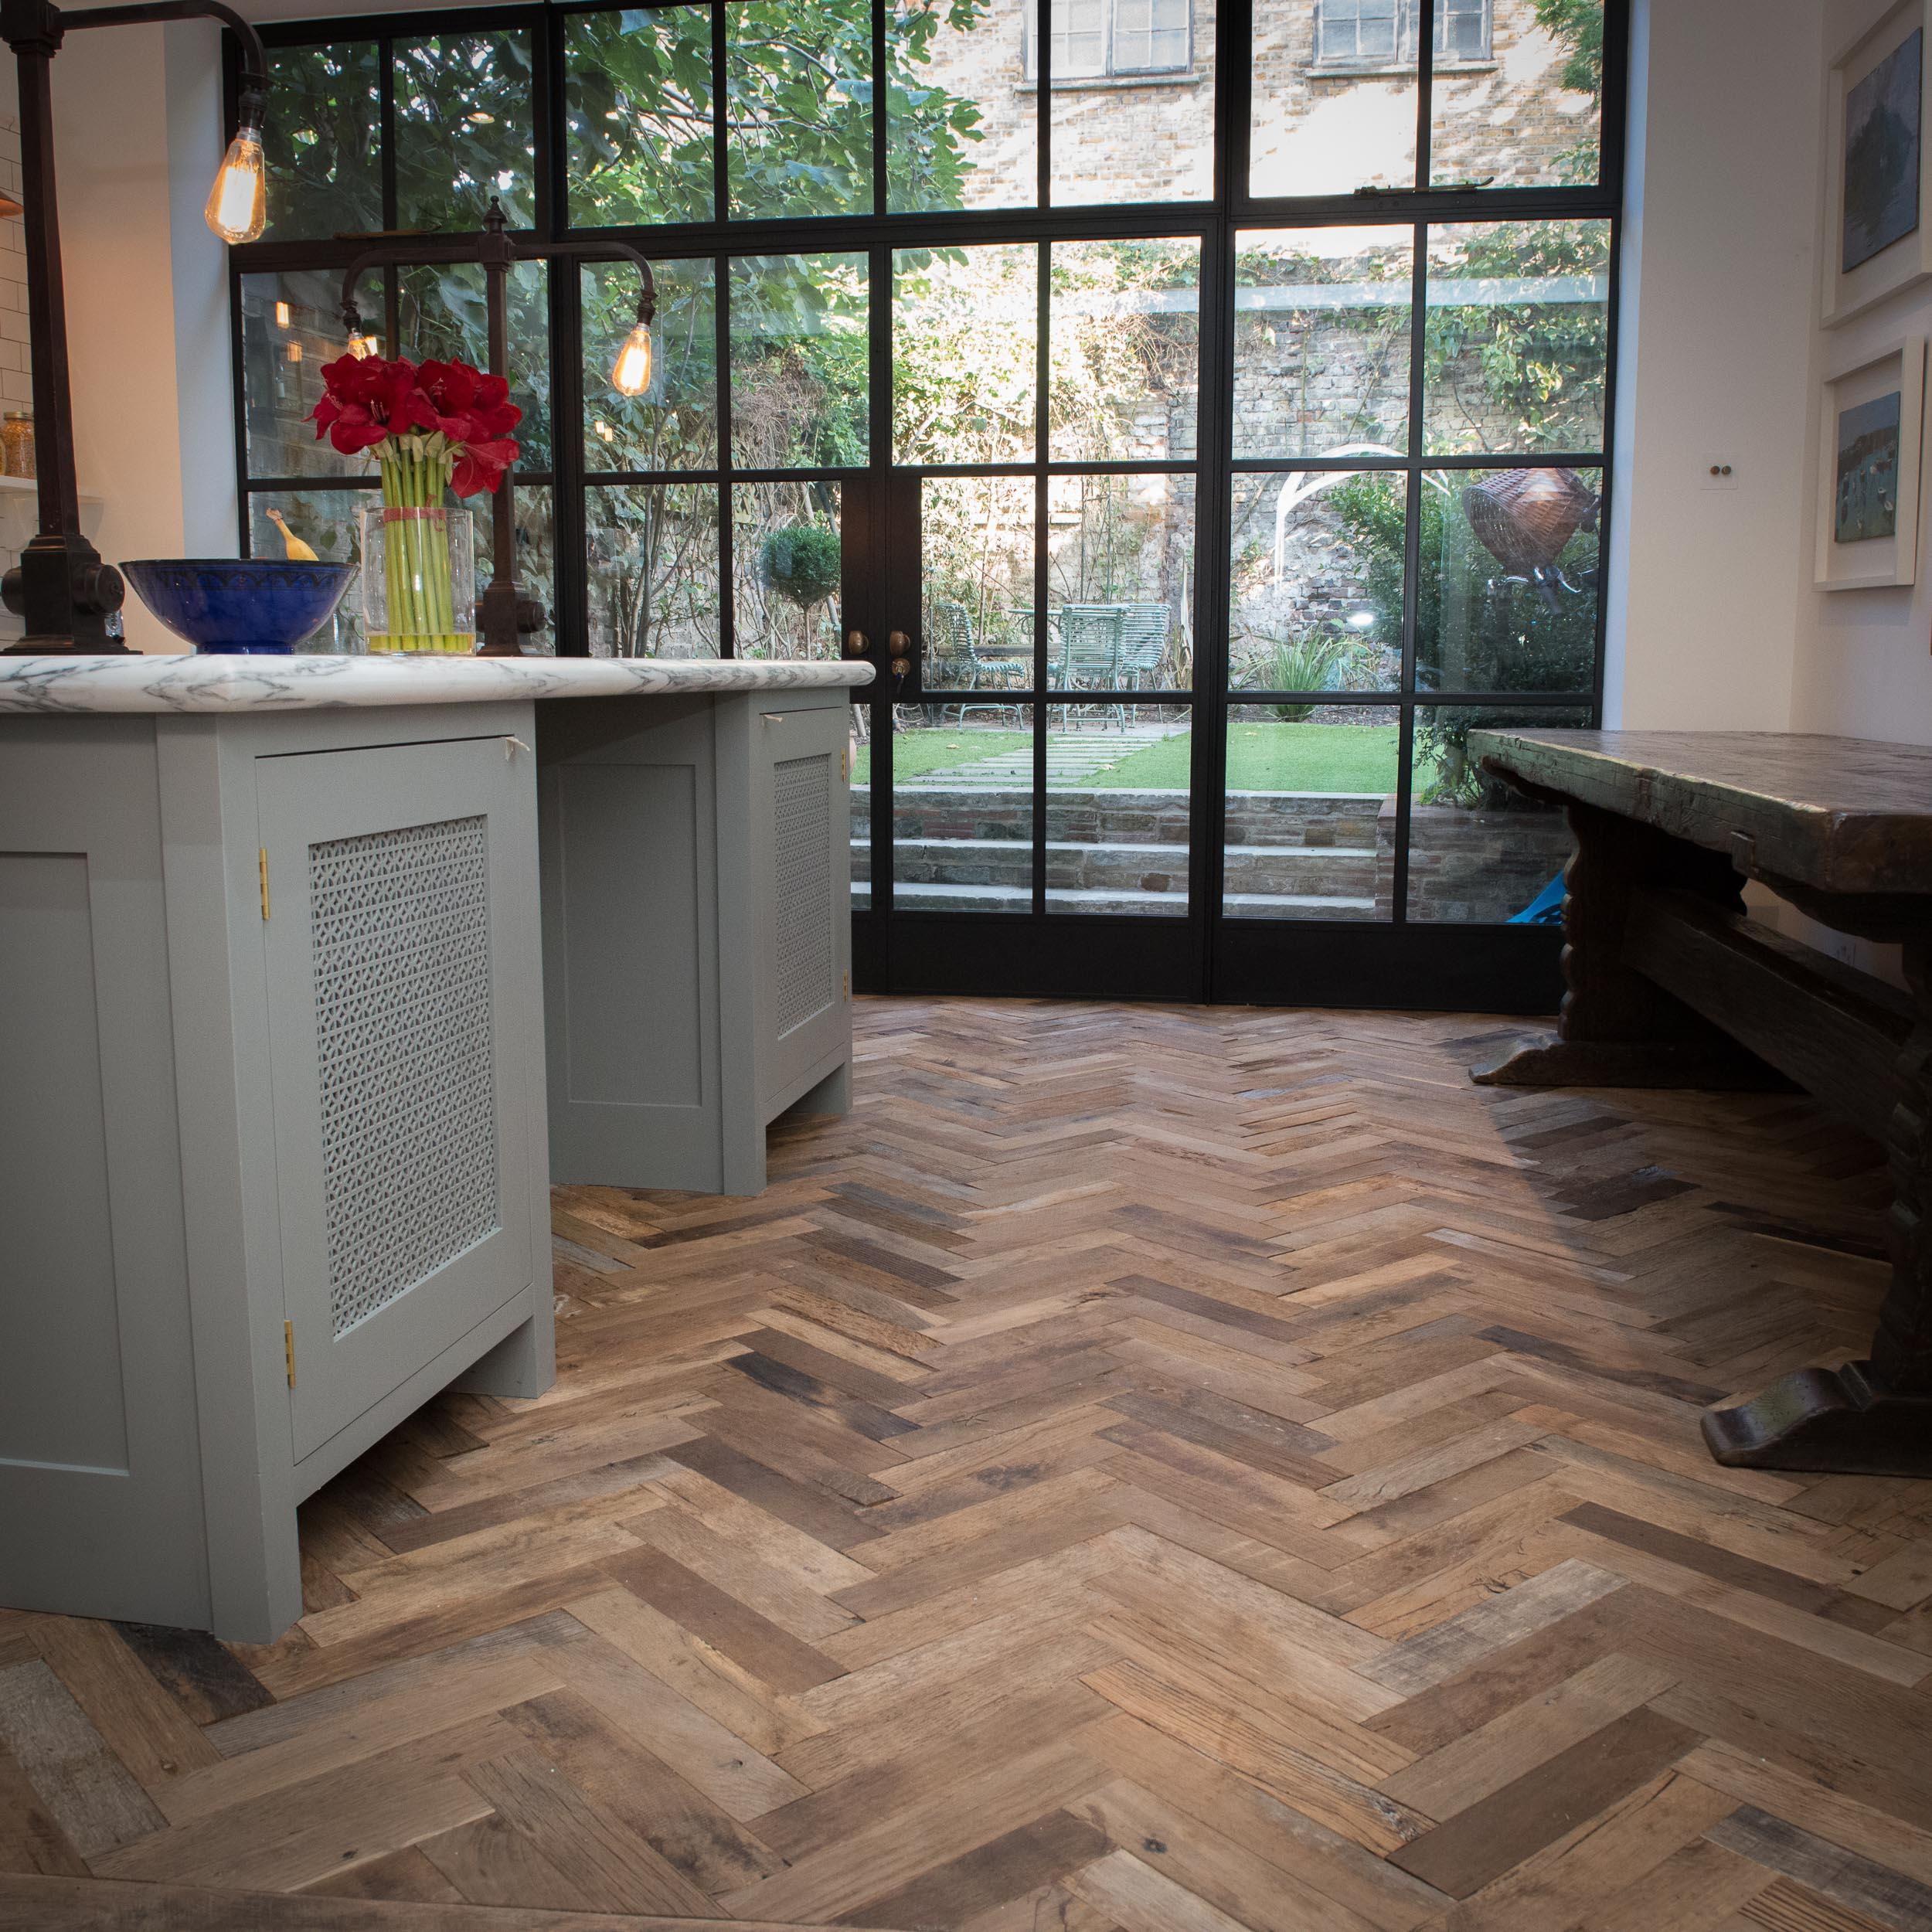 Reclaimed Oak Herringbone in kitchen with crittall windows